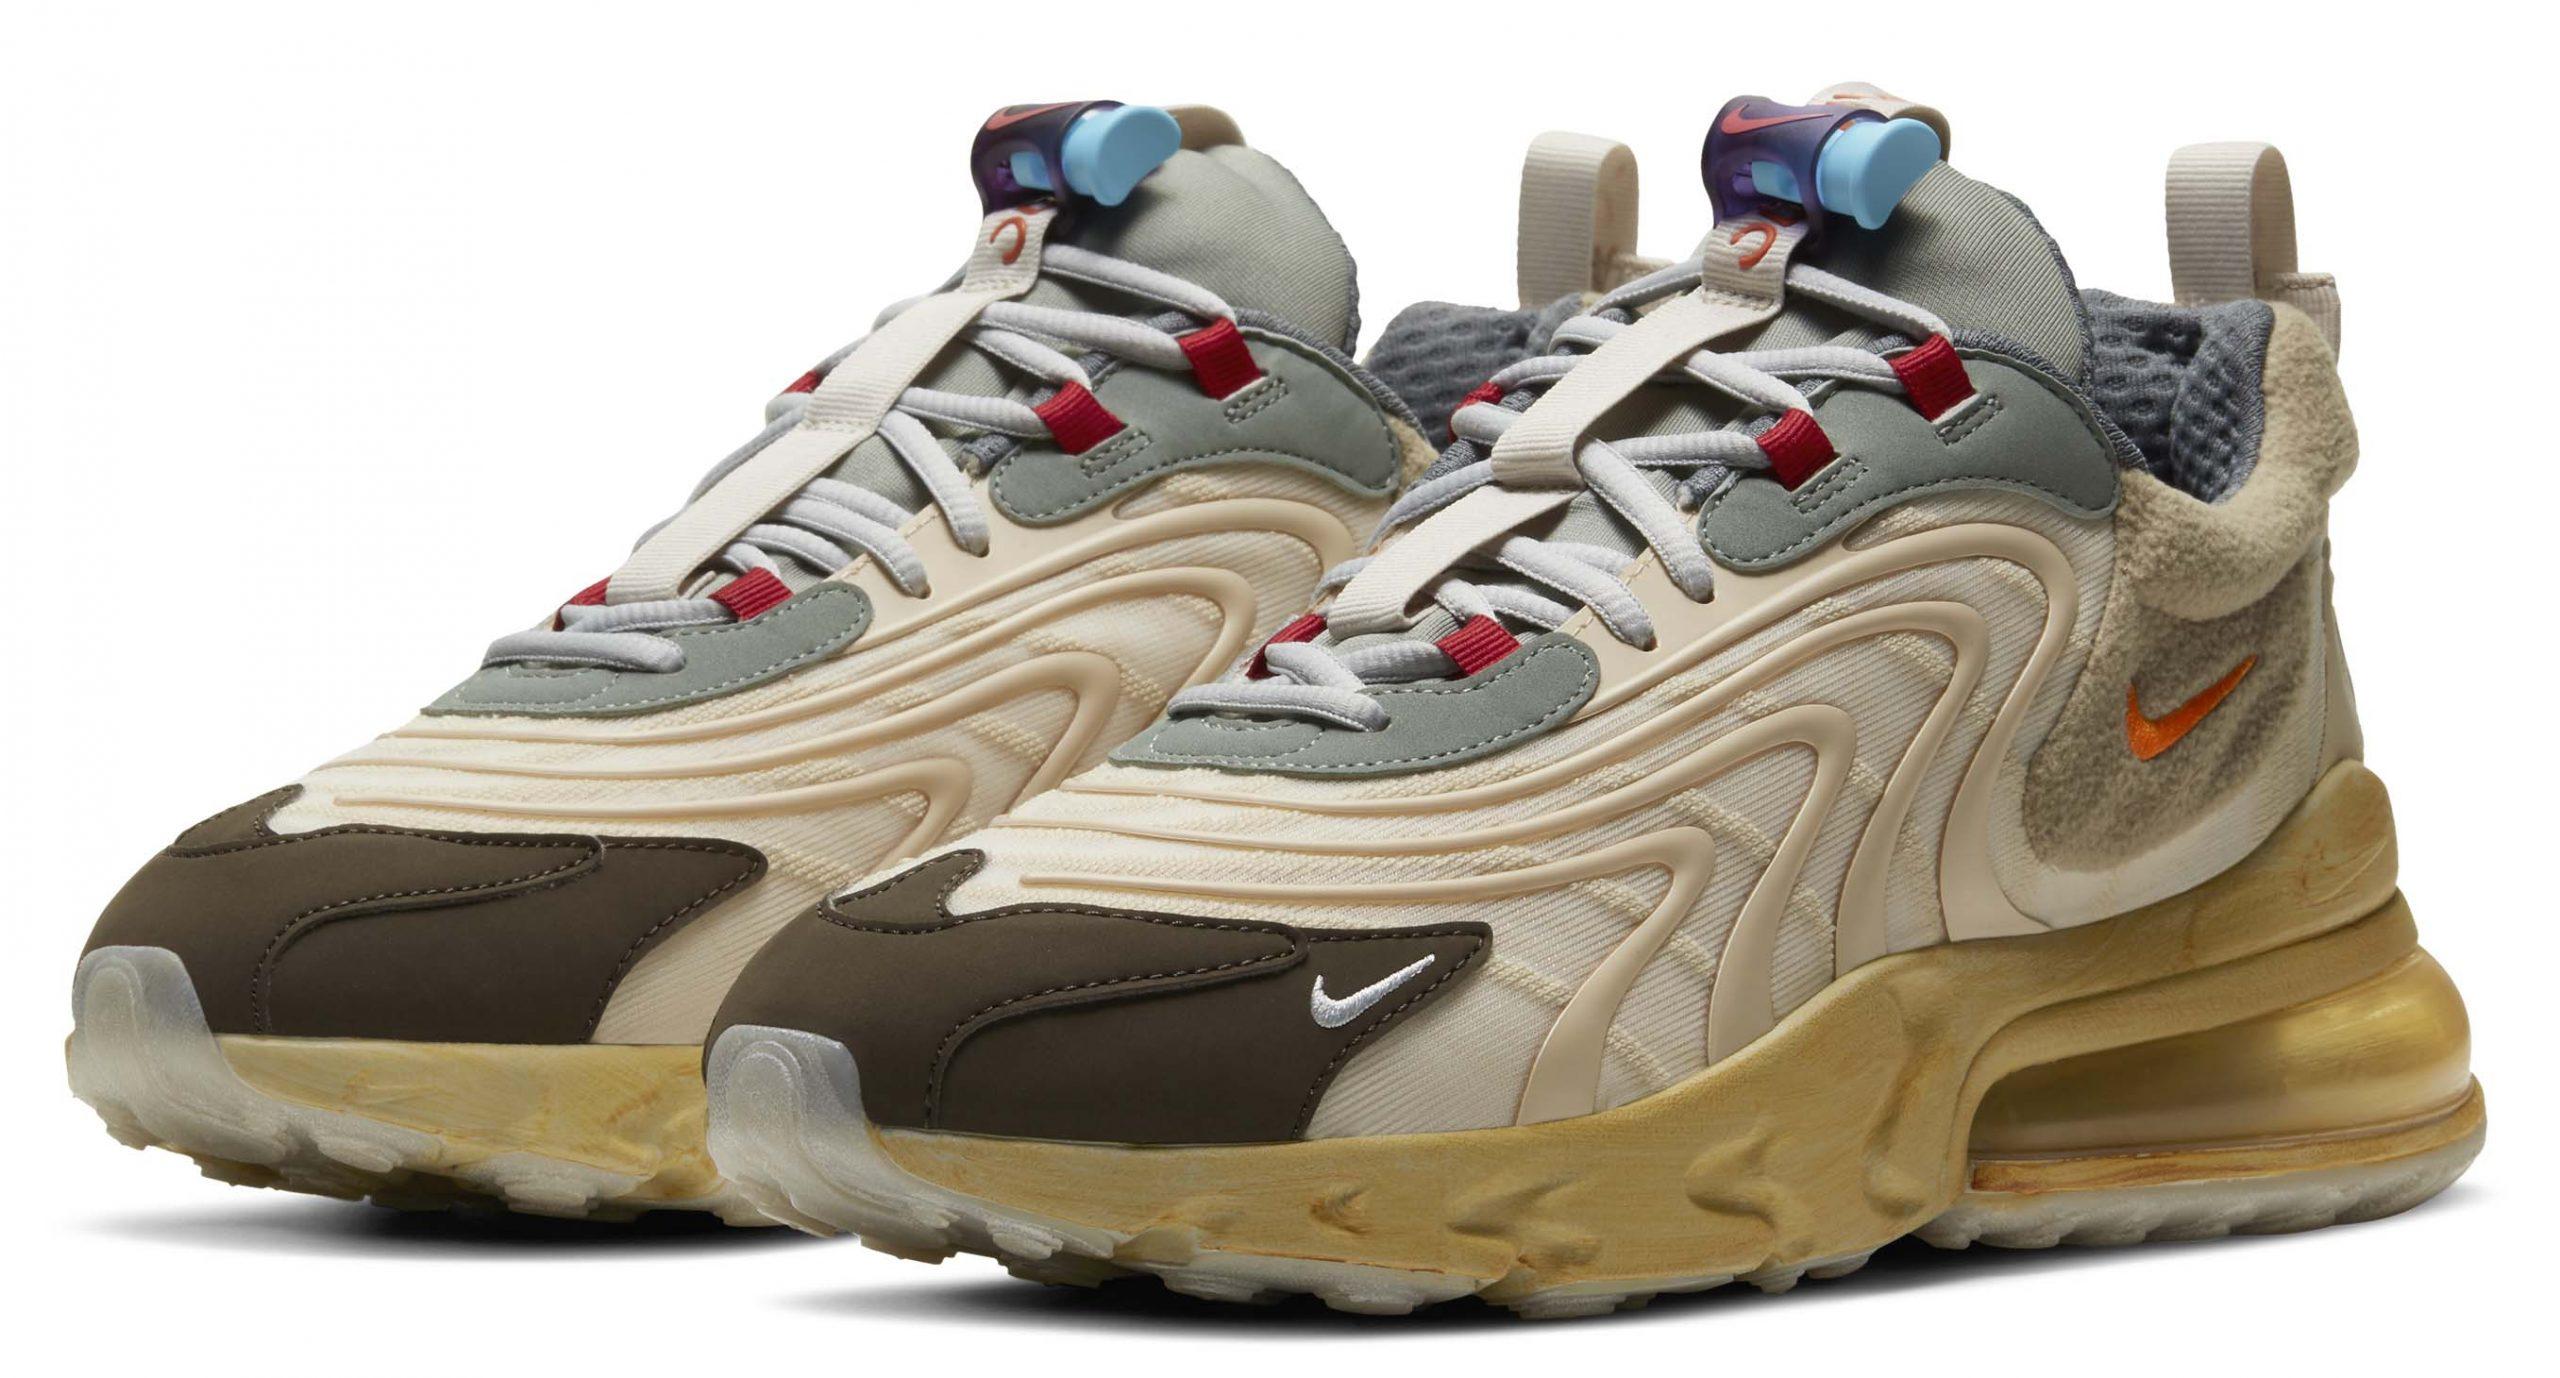 Nike x Travis Scott豐富細節,玩味十足